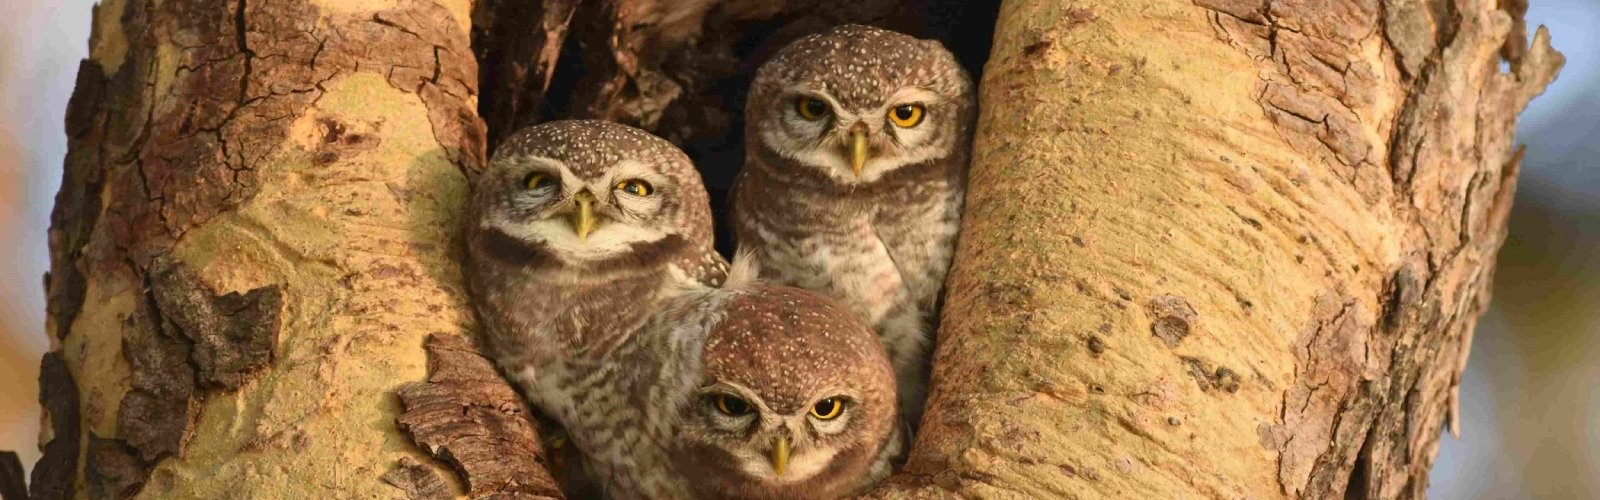 Spotted Owlet, Bagan, Myanmar, 2017 Laurens Steijn